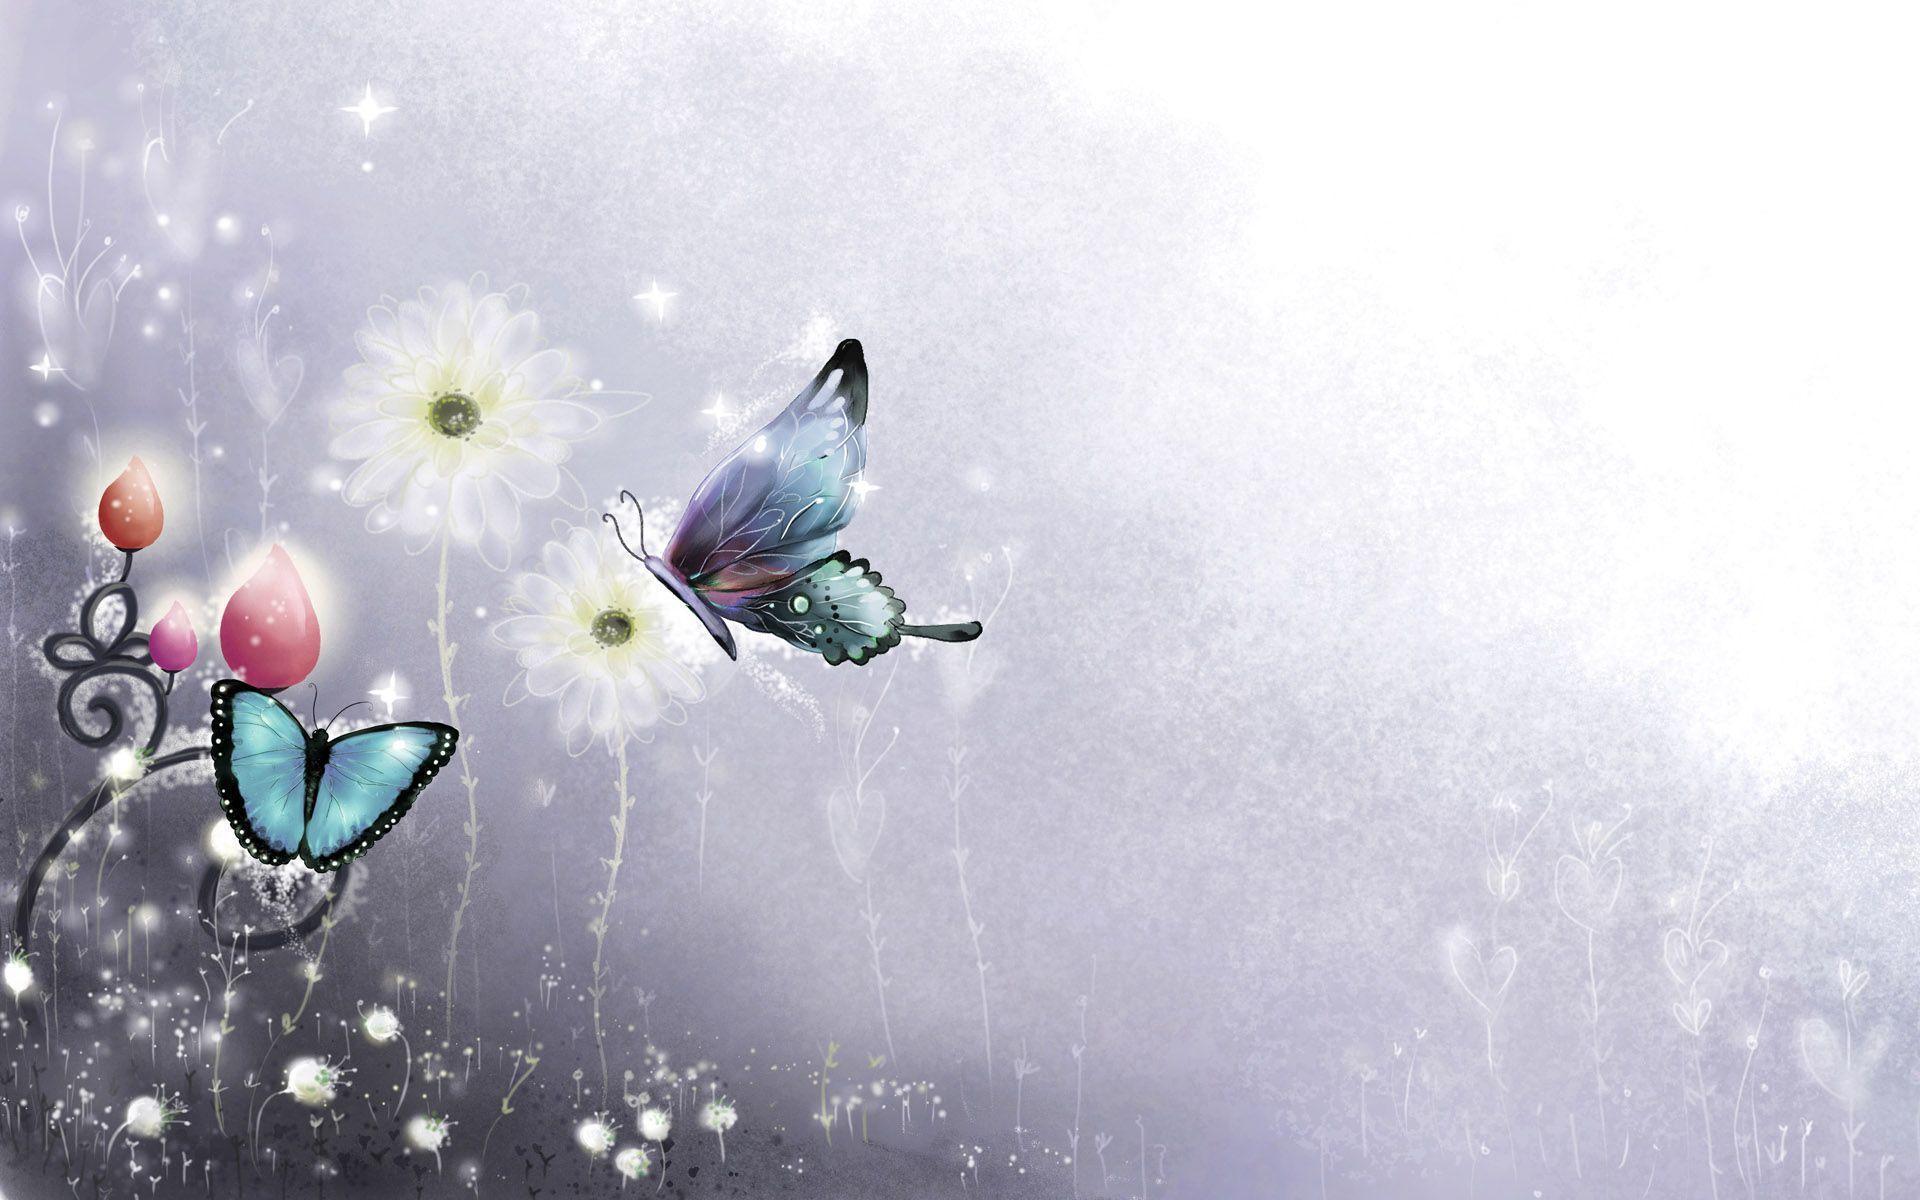 Butterflies-HD-Wallpapers-5 - AHD Images